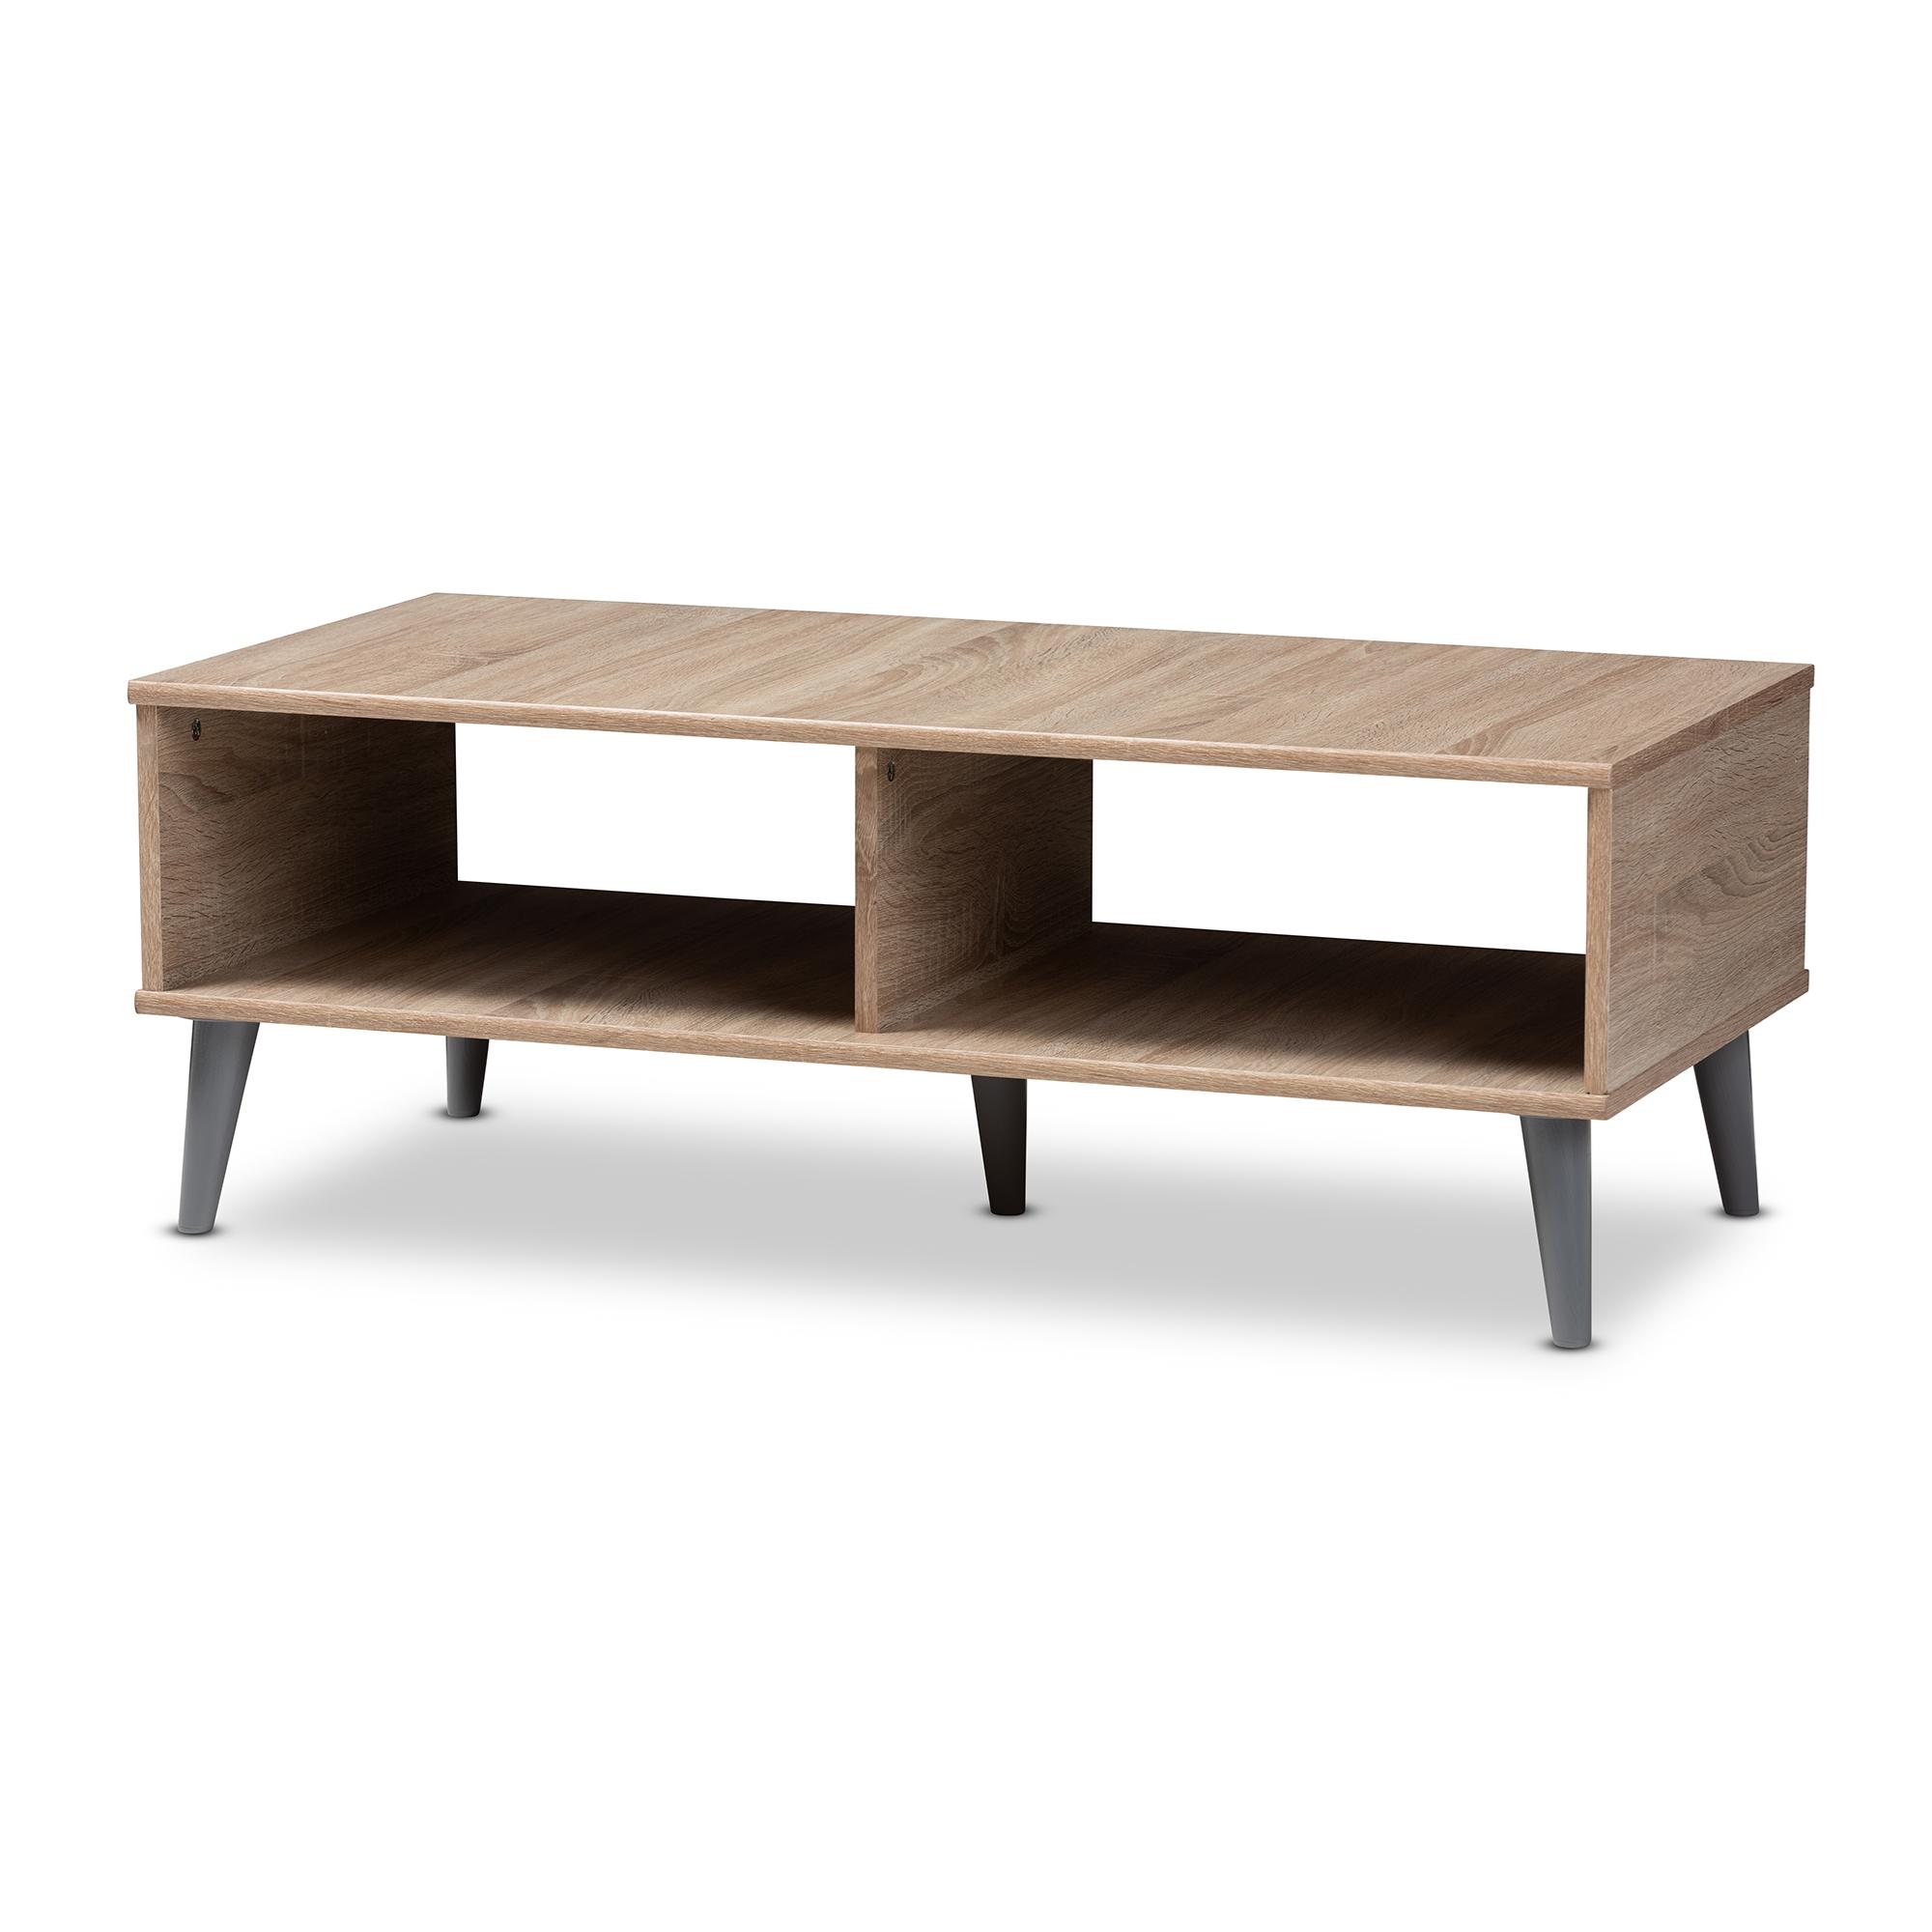 Baxton studio pierre mid century modern oak and light grey finished wood coffee table